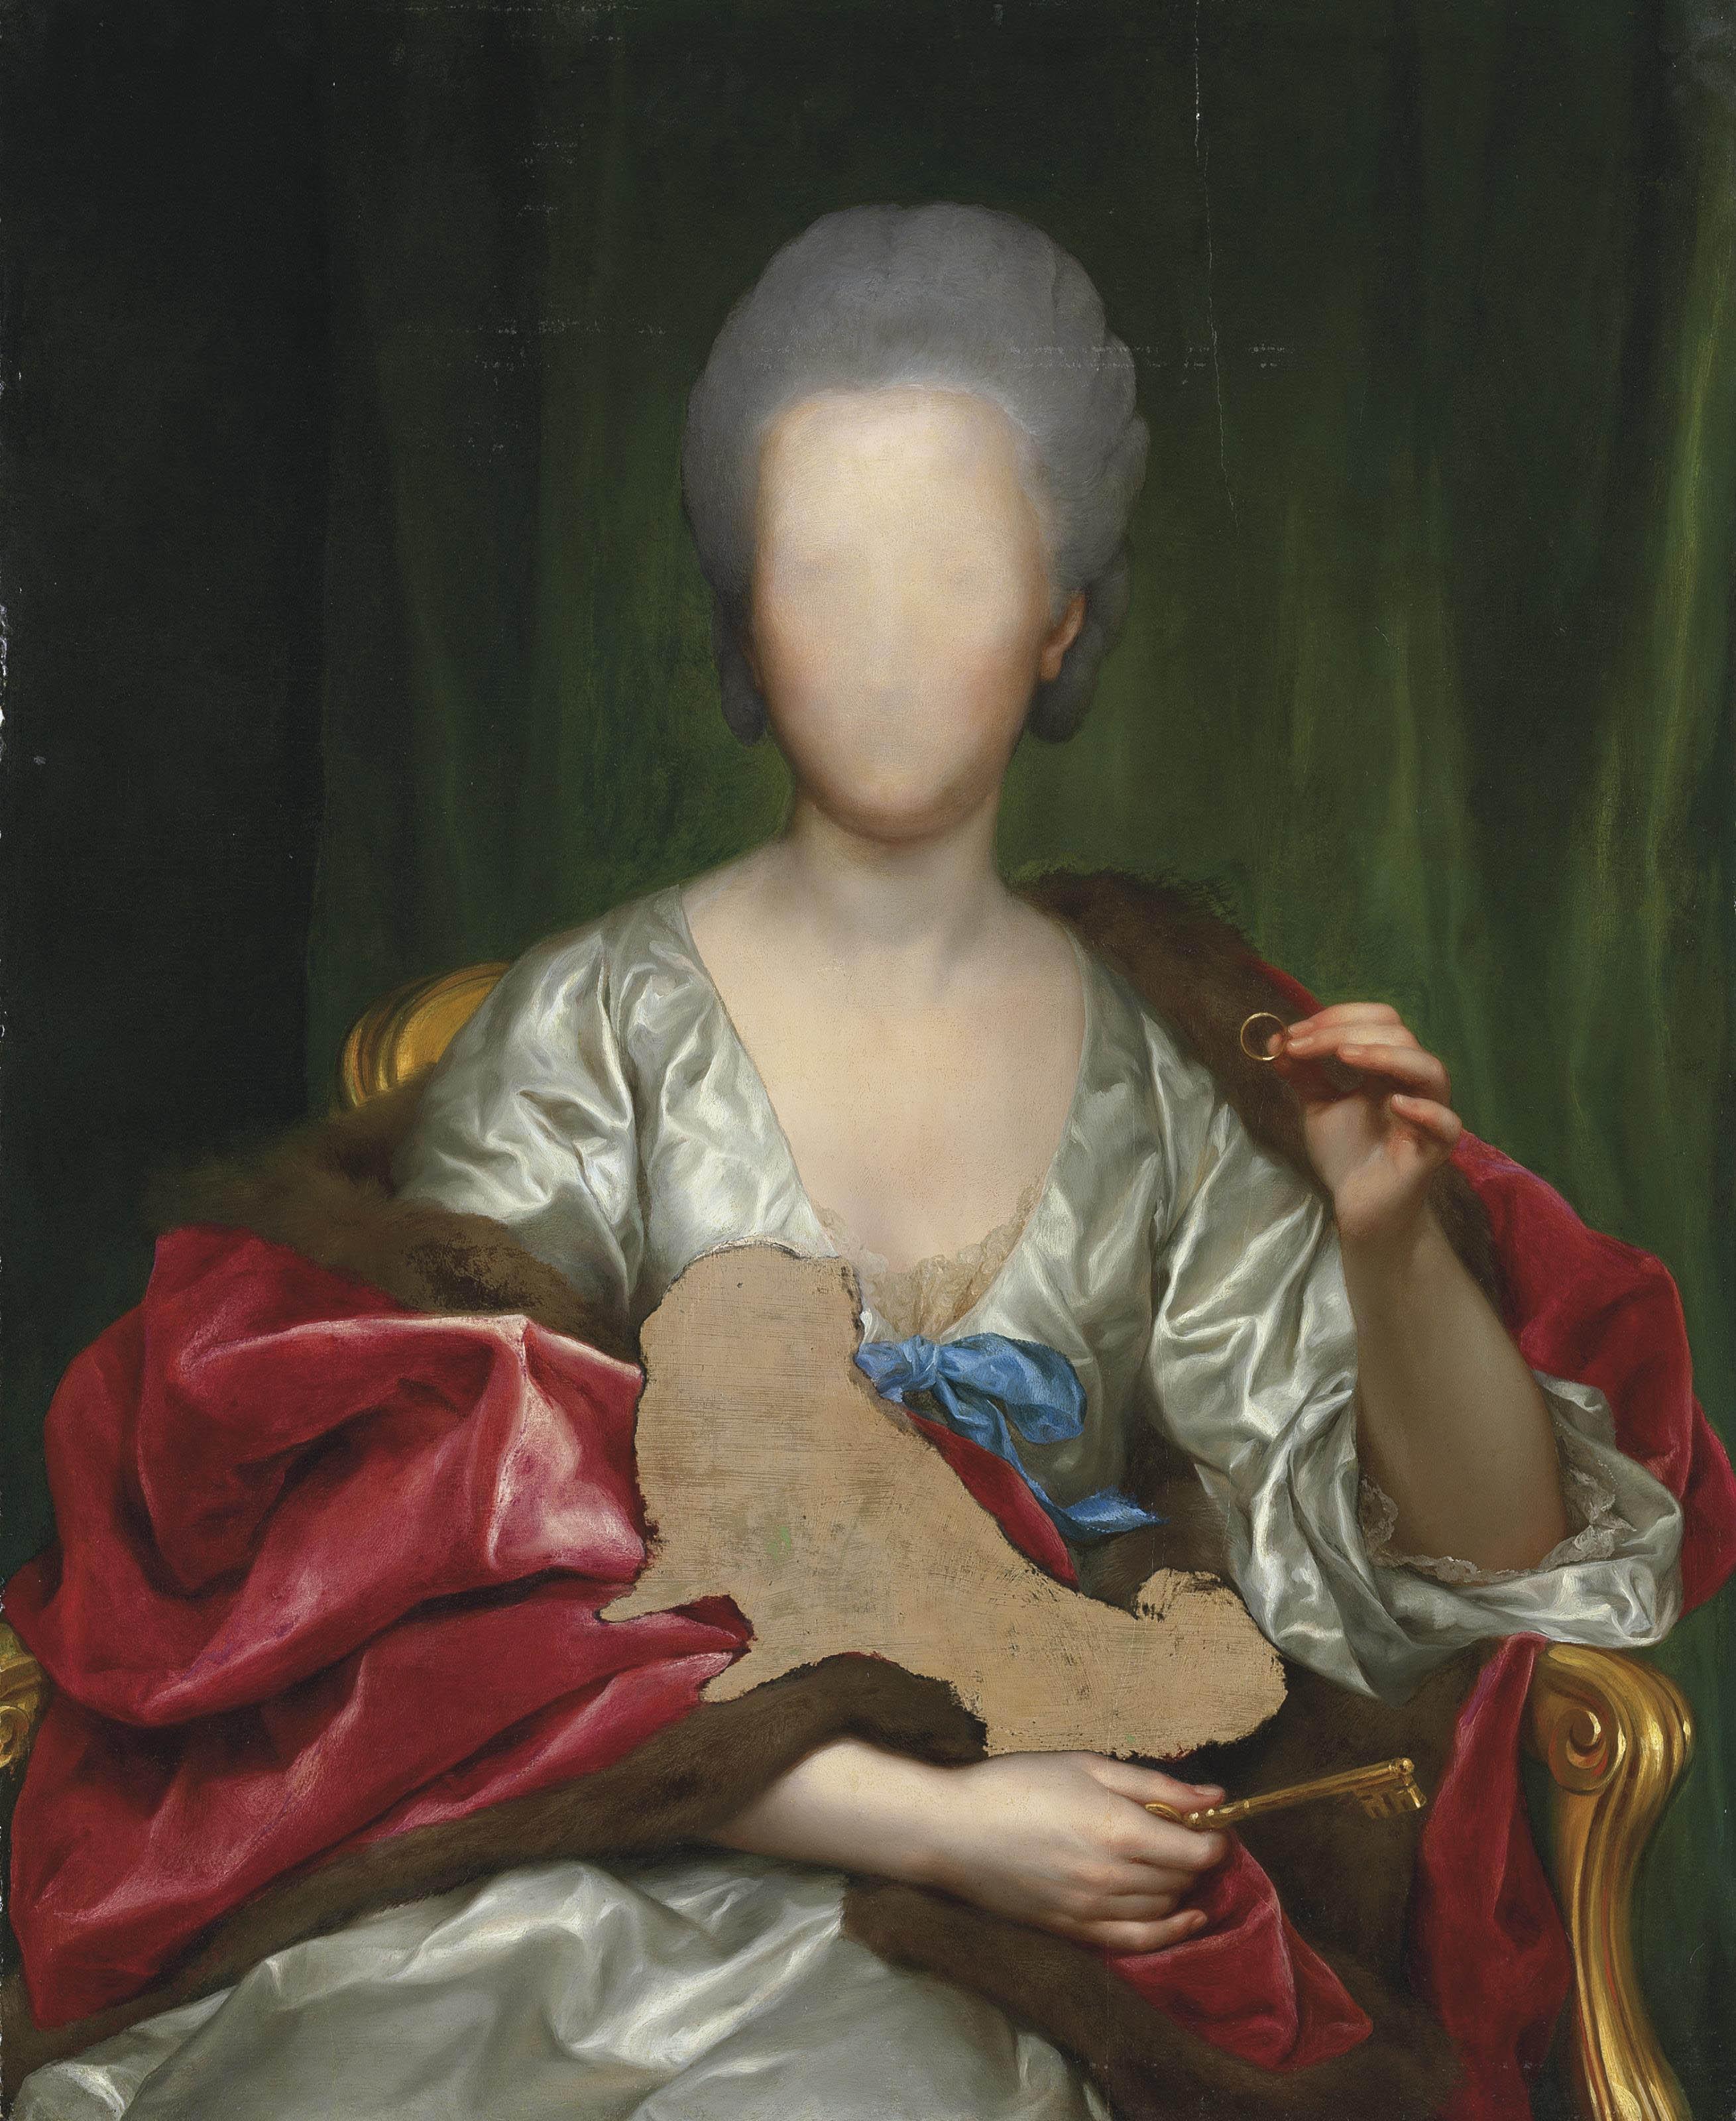 Anton Raffael Mengs (Aussig, Bohemia 1728-1779 Rome)